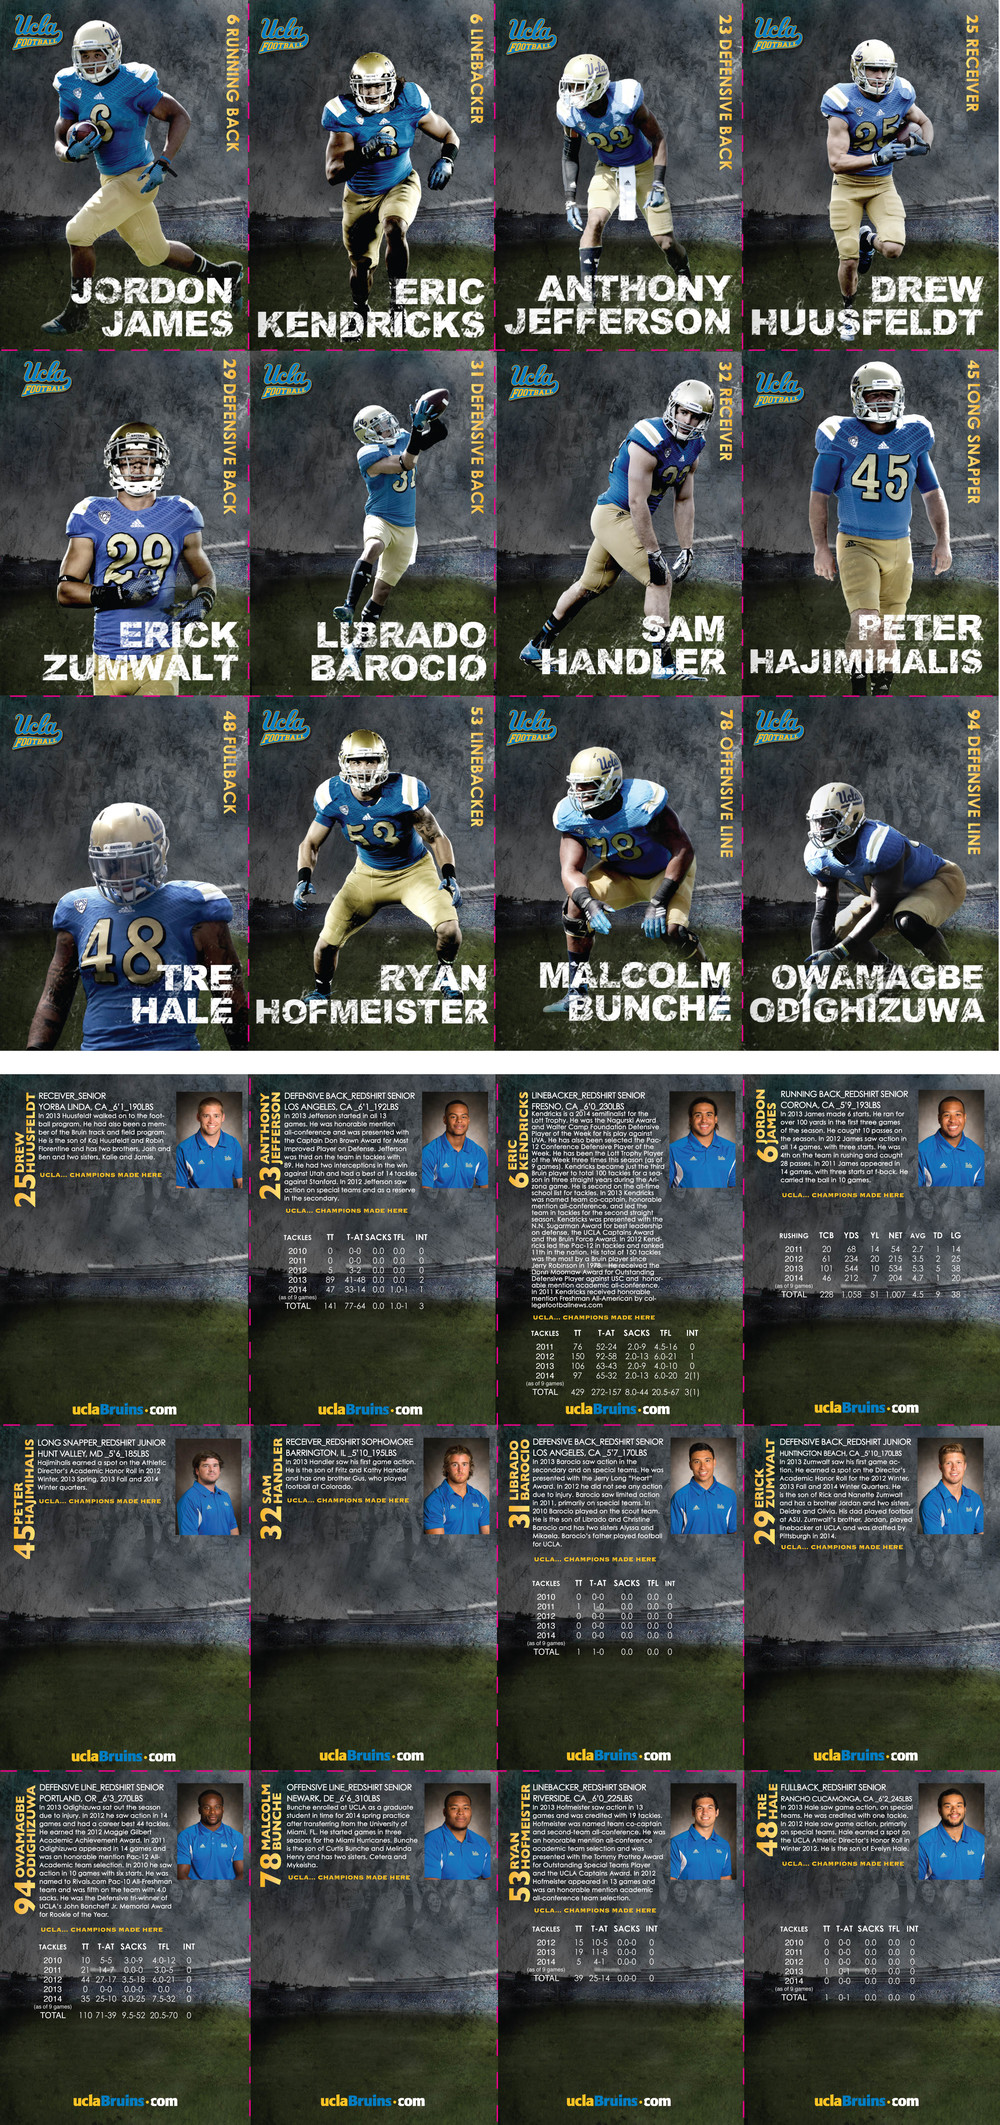 2014_UCLAFOOTBALL_CARDs-2-web.jpg